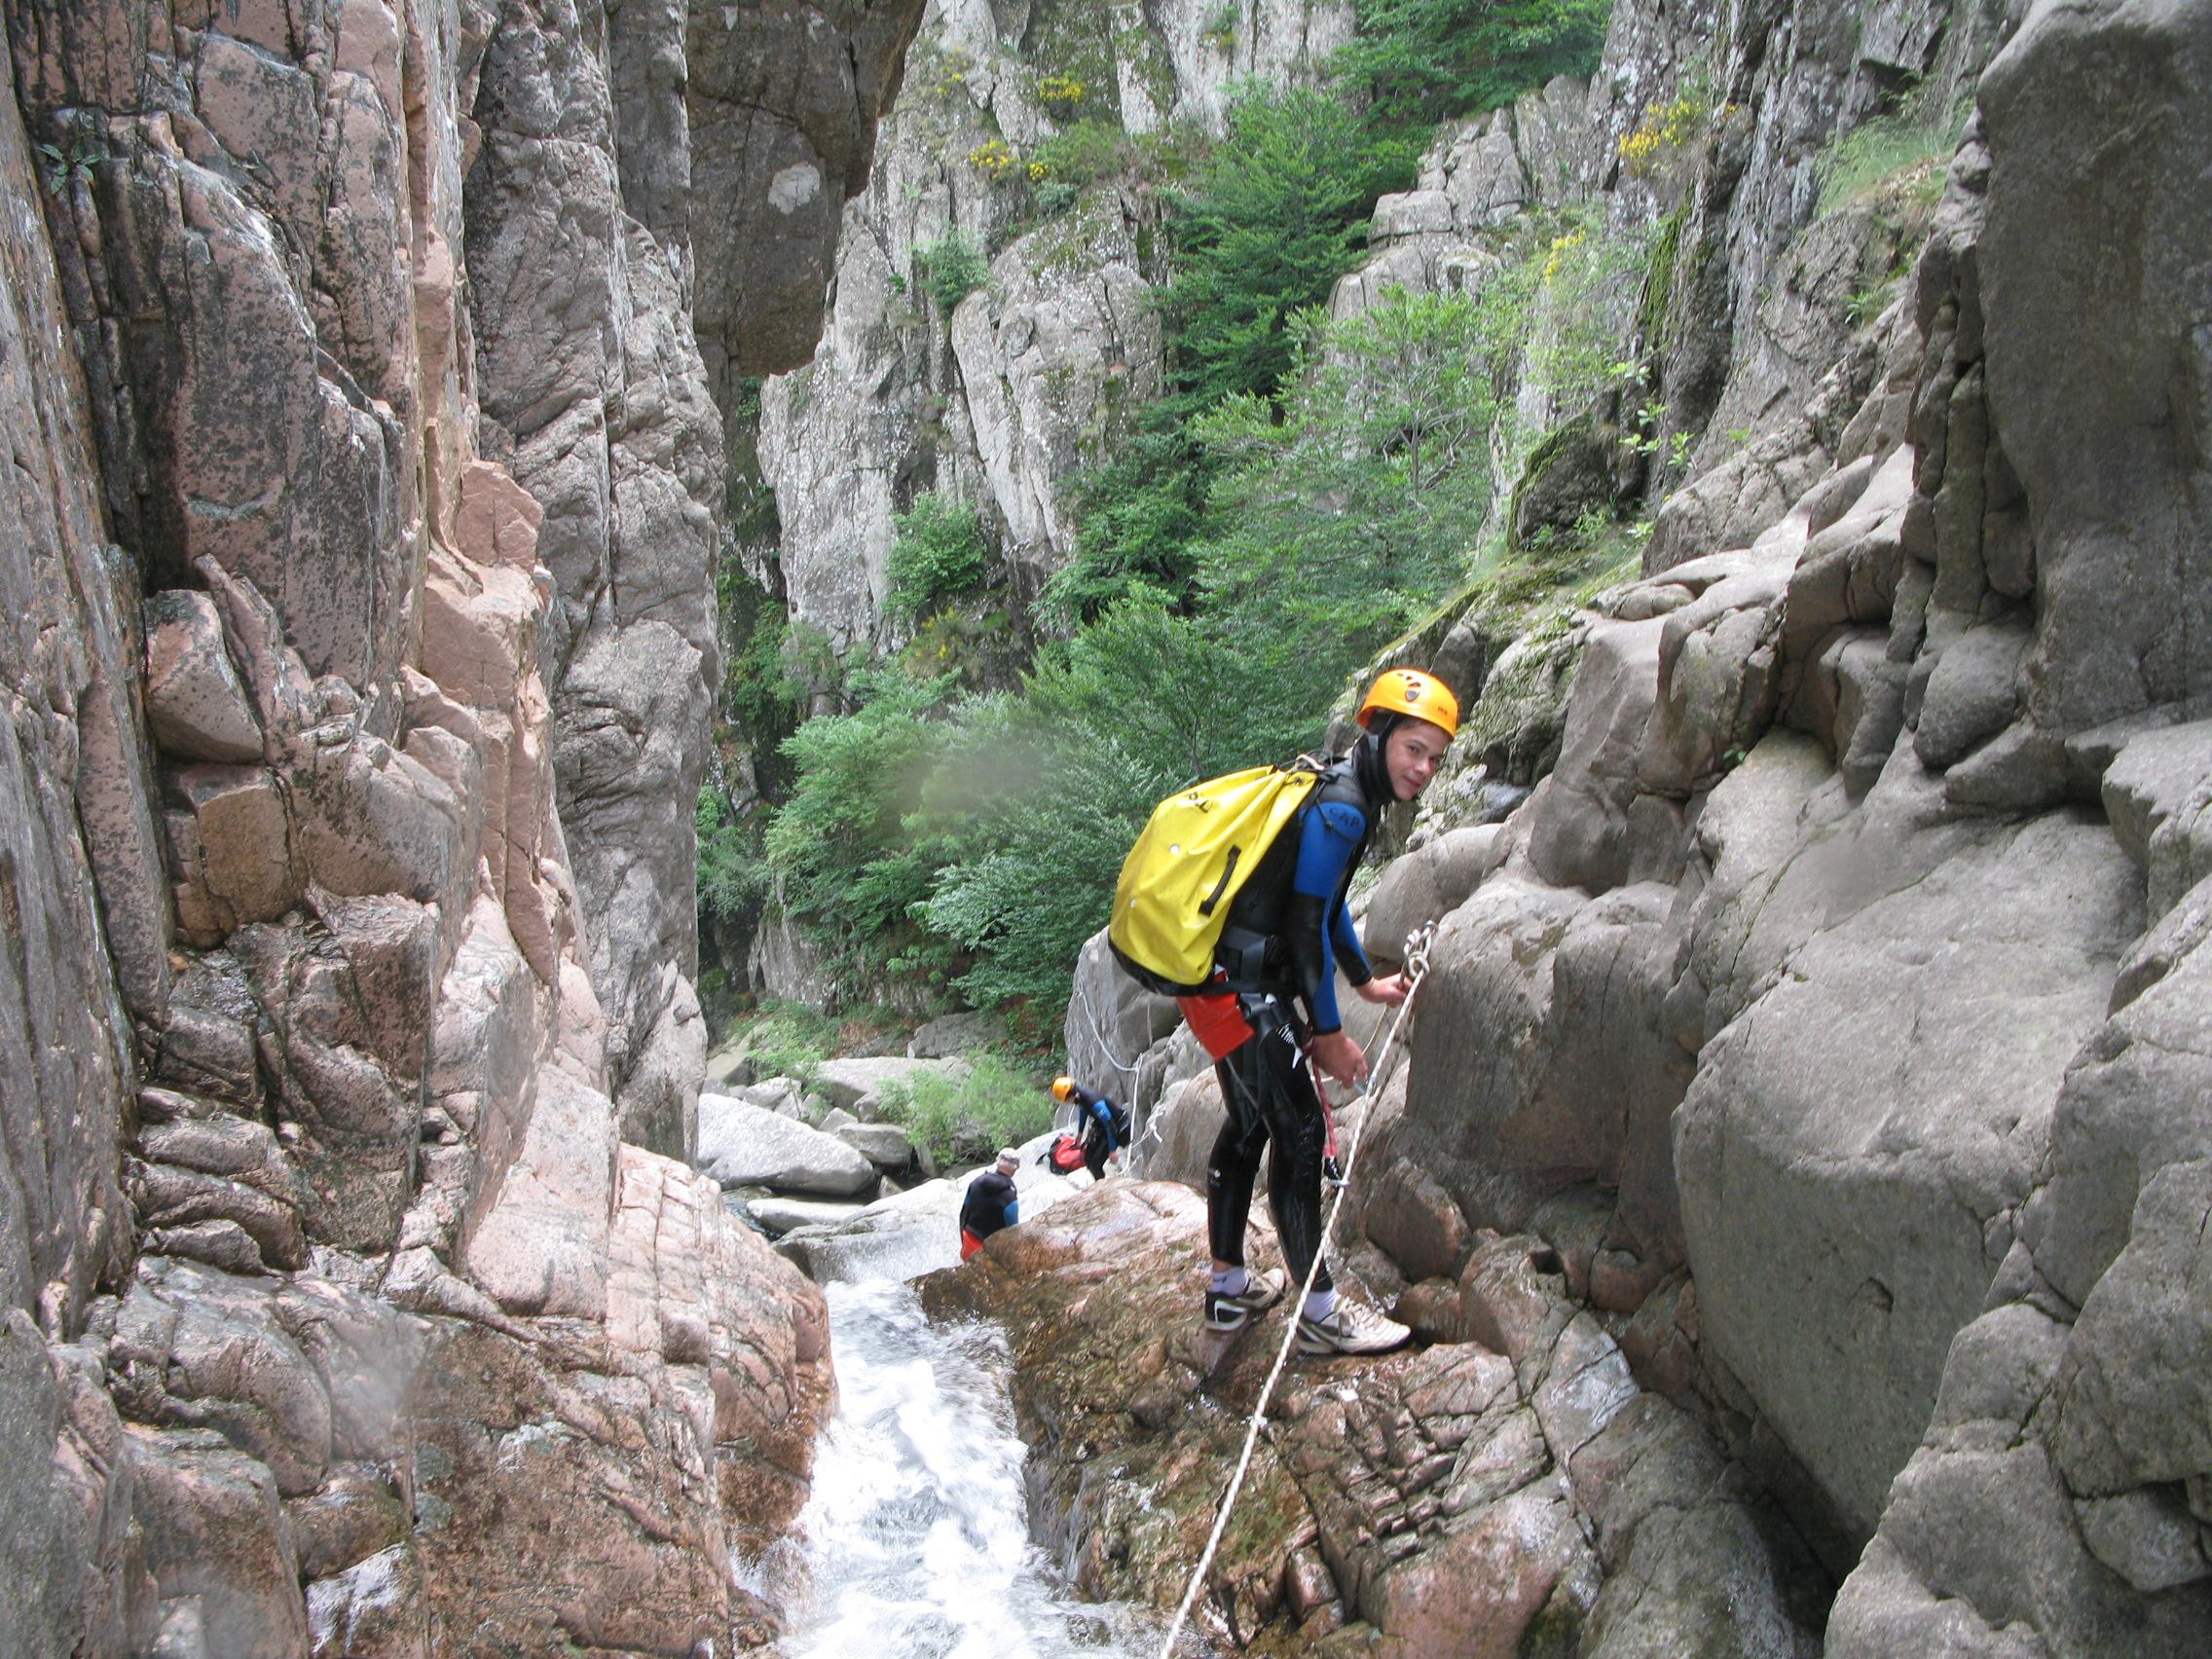 Canyoning sportif dans les gorges du Chassezac